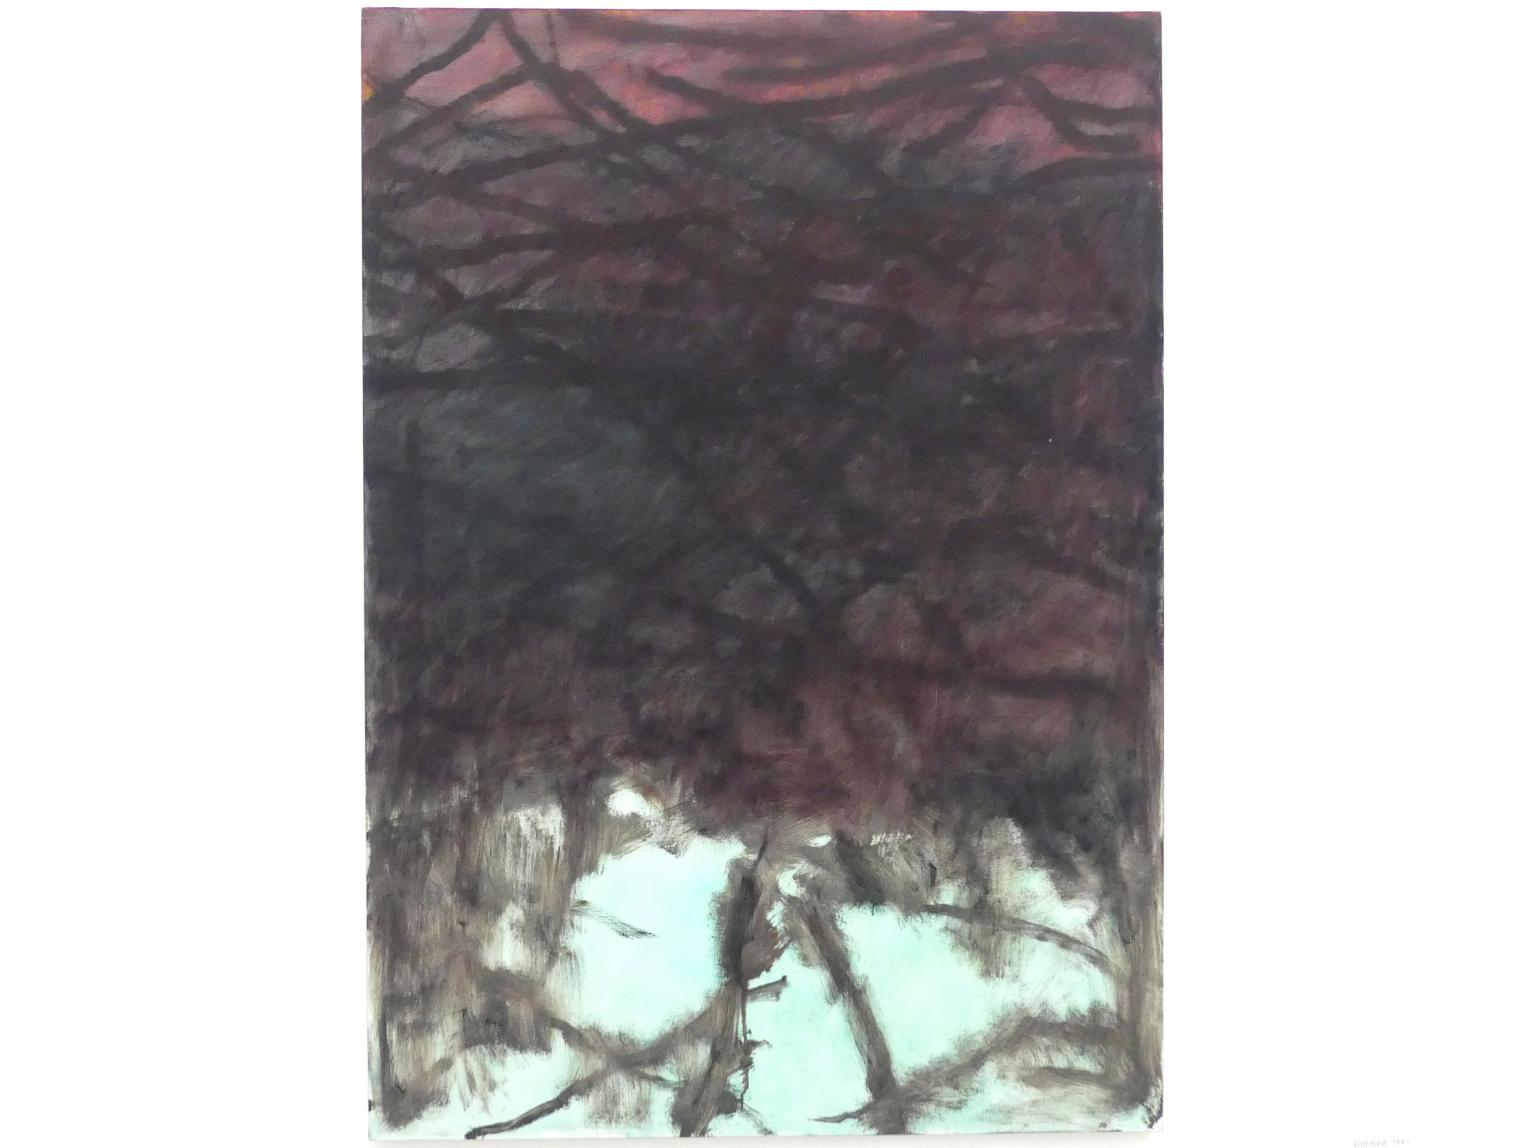 Raoul De Keyser: Untitled, 1991